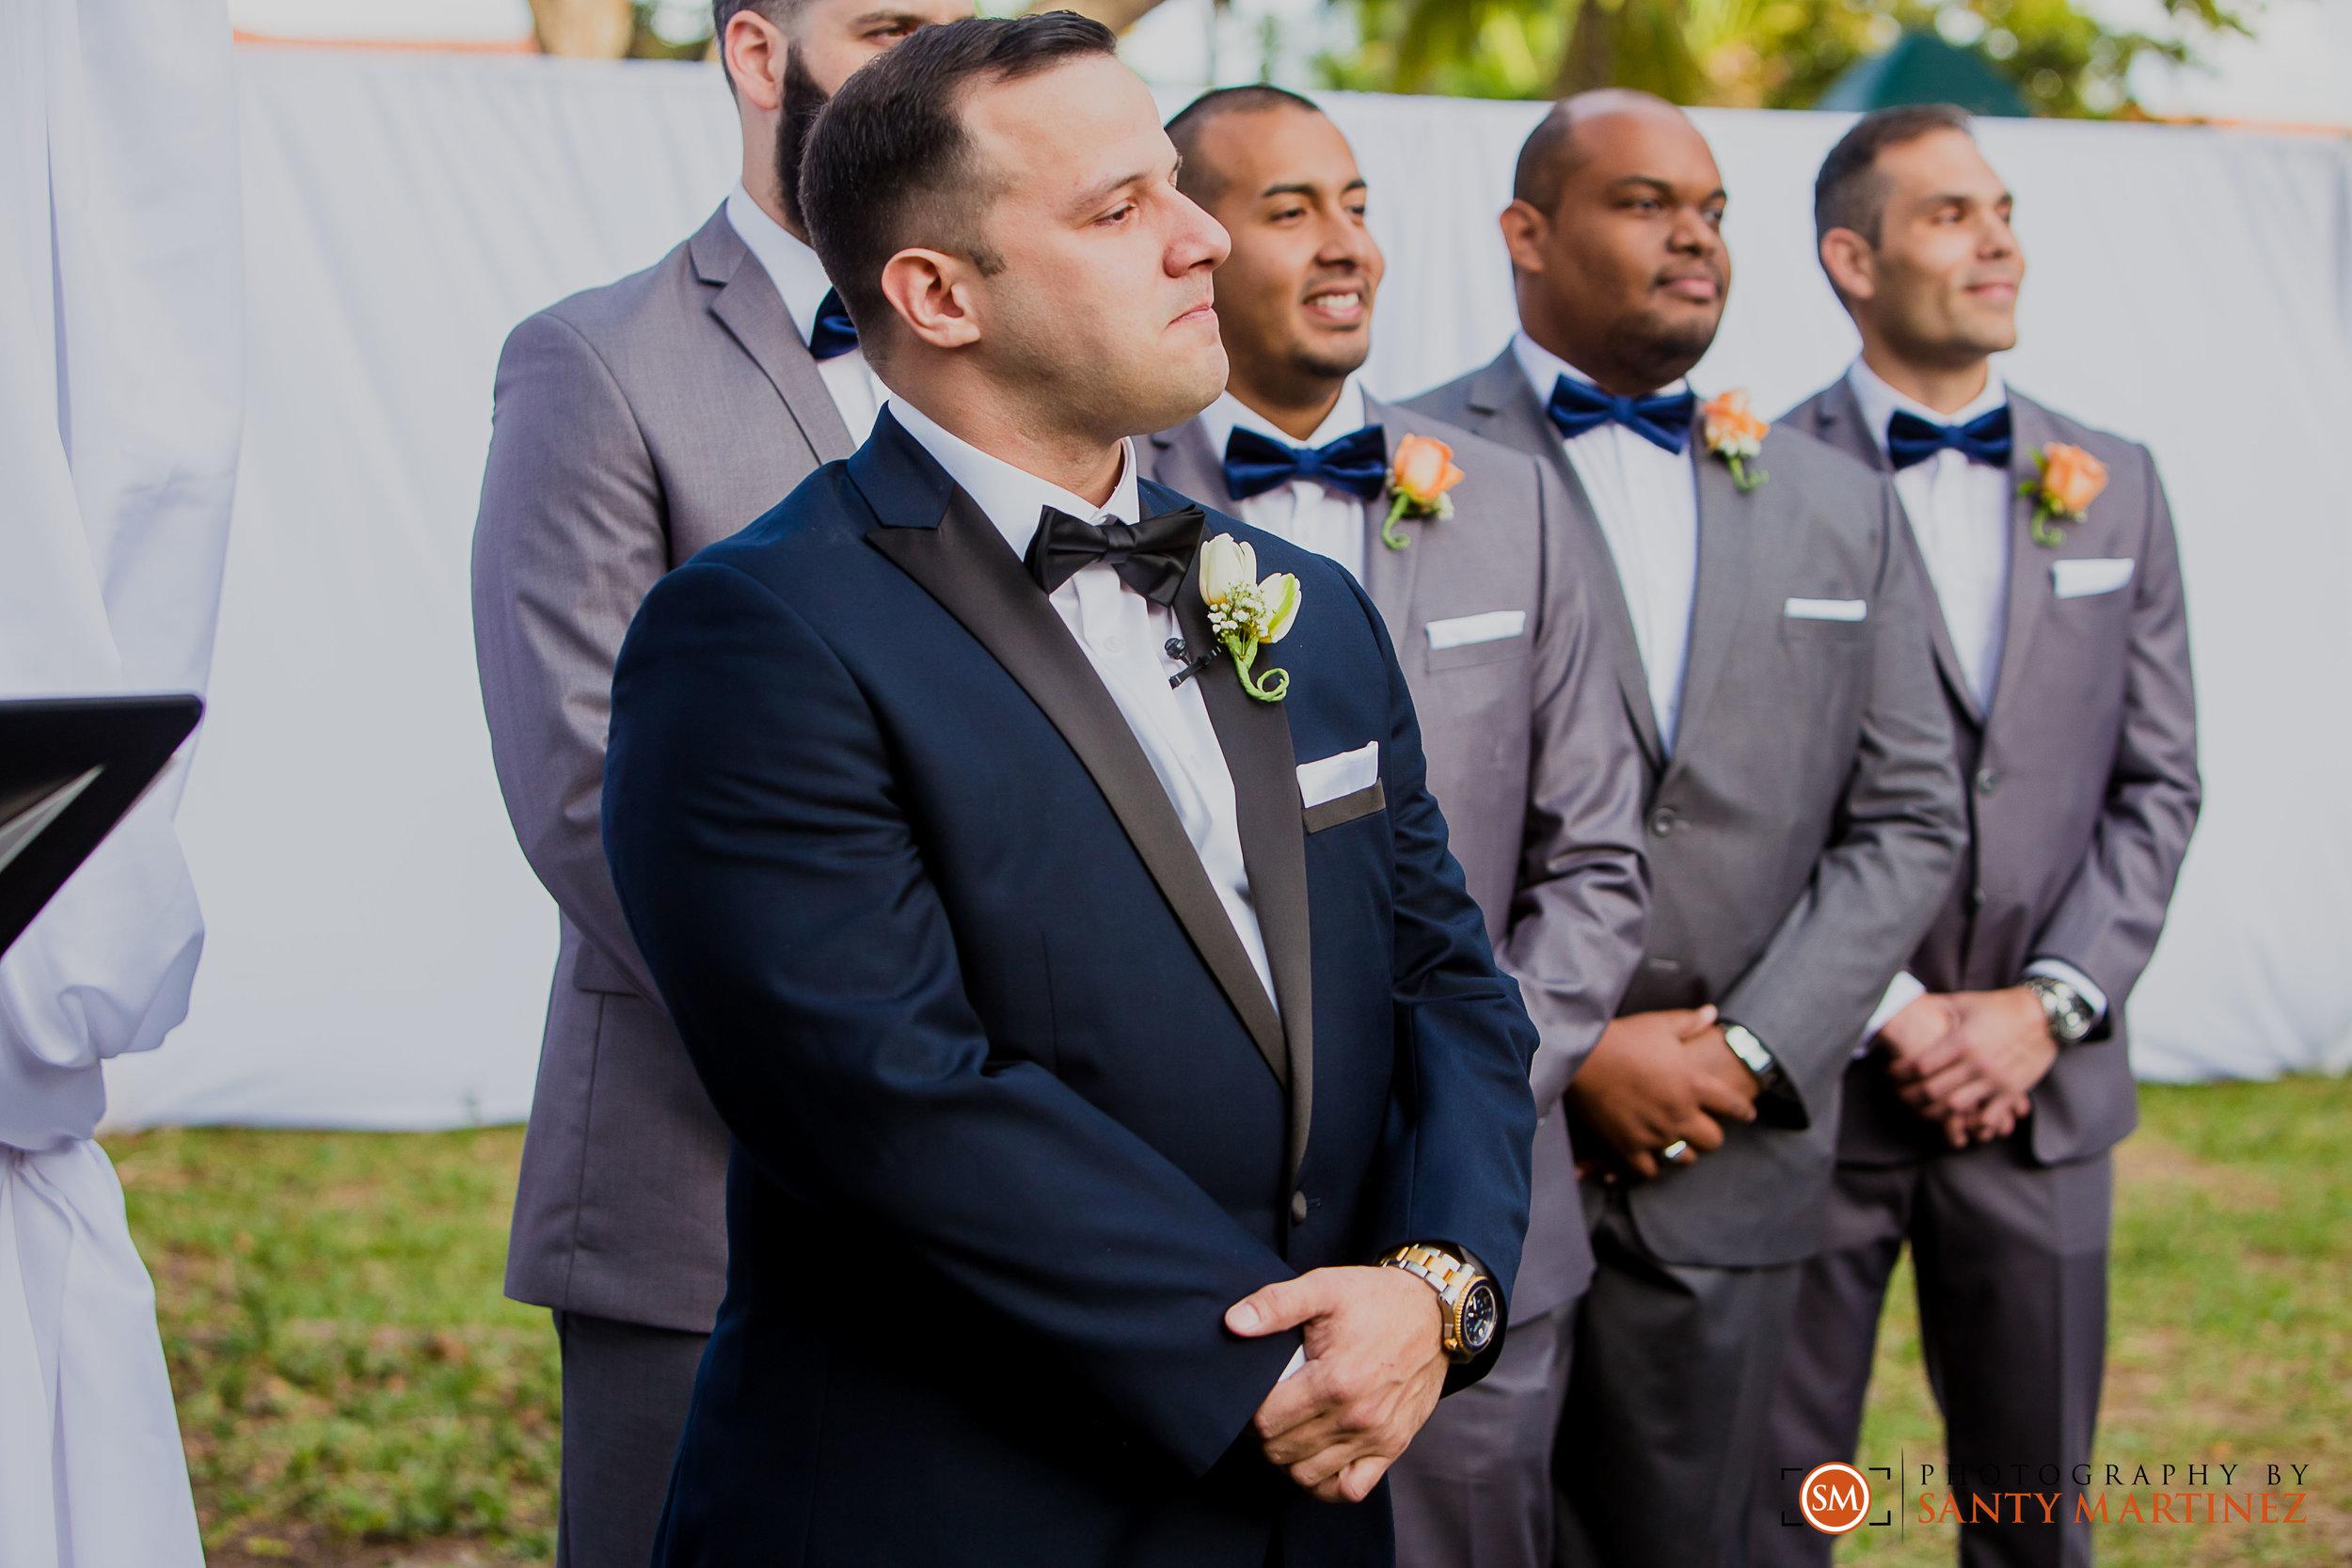 Wedding La Jolla Ballroom - Photography by Santy Martinez-29.jpg